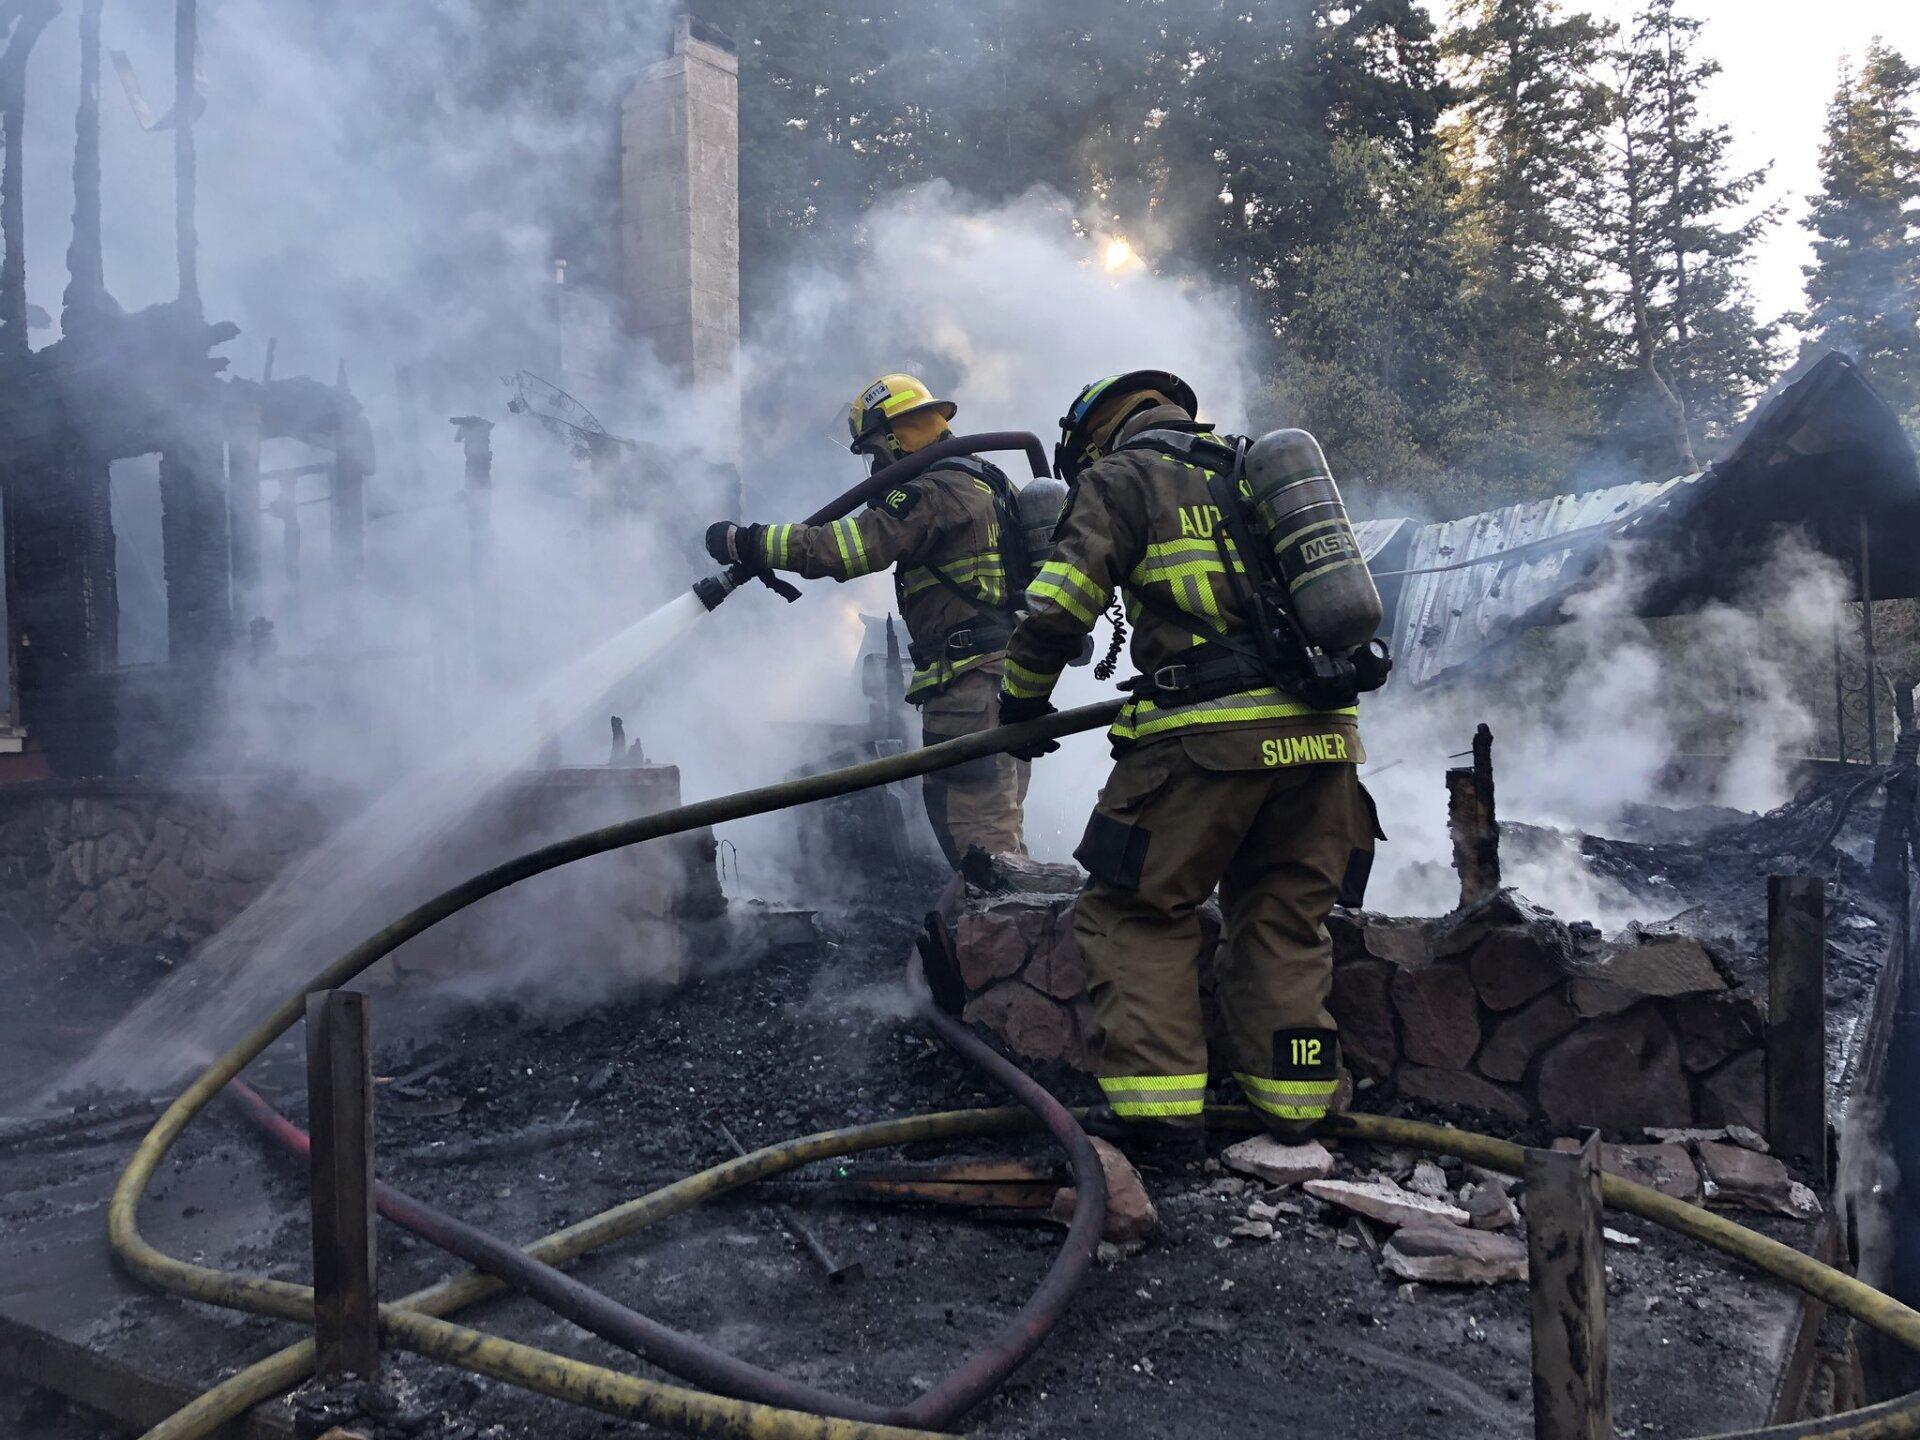 Photos: Fire destroys cabin in Parley'sCanyon